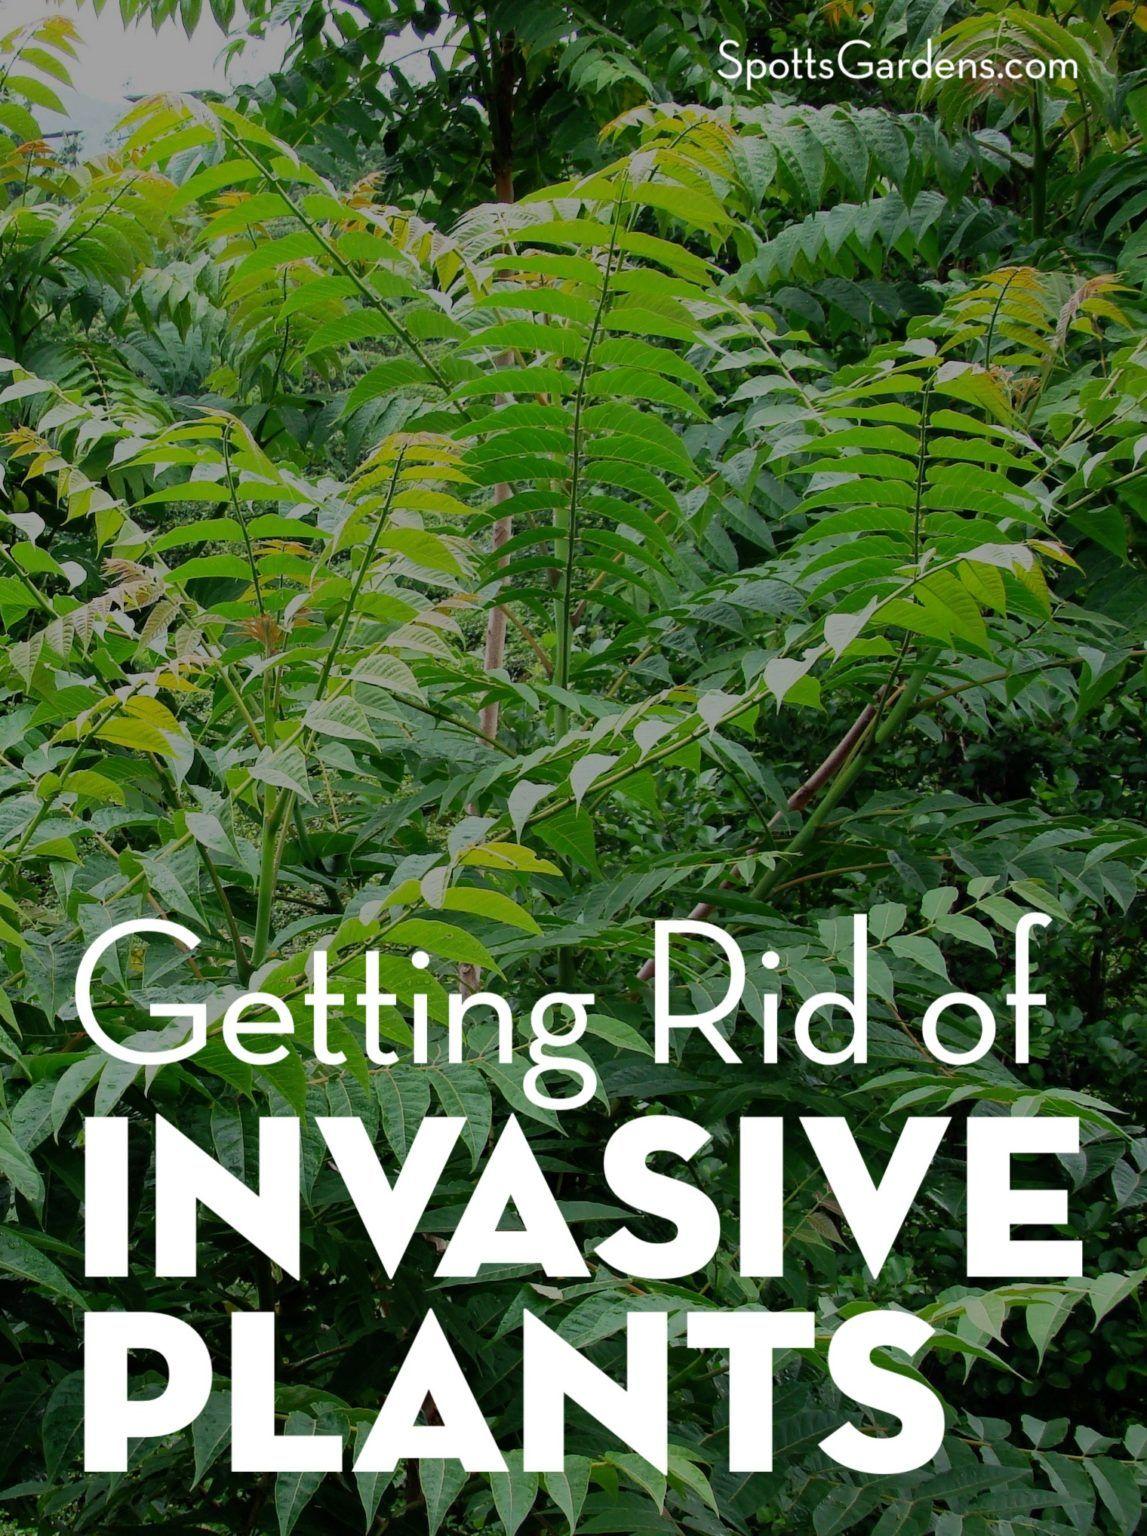 Getting rid of invasive plants spotts garden service in